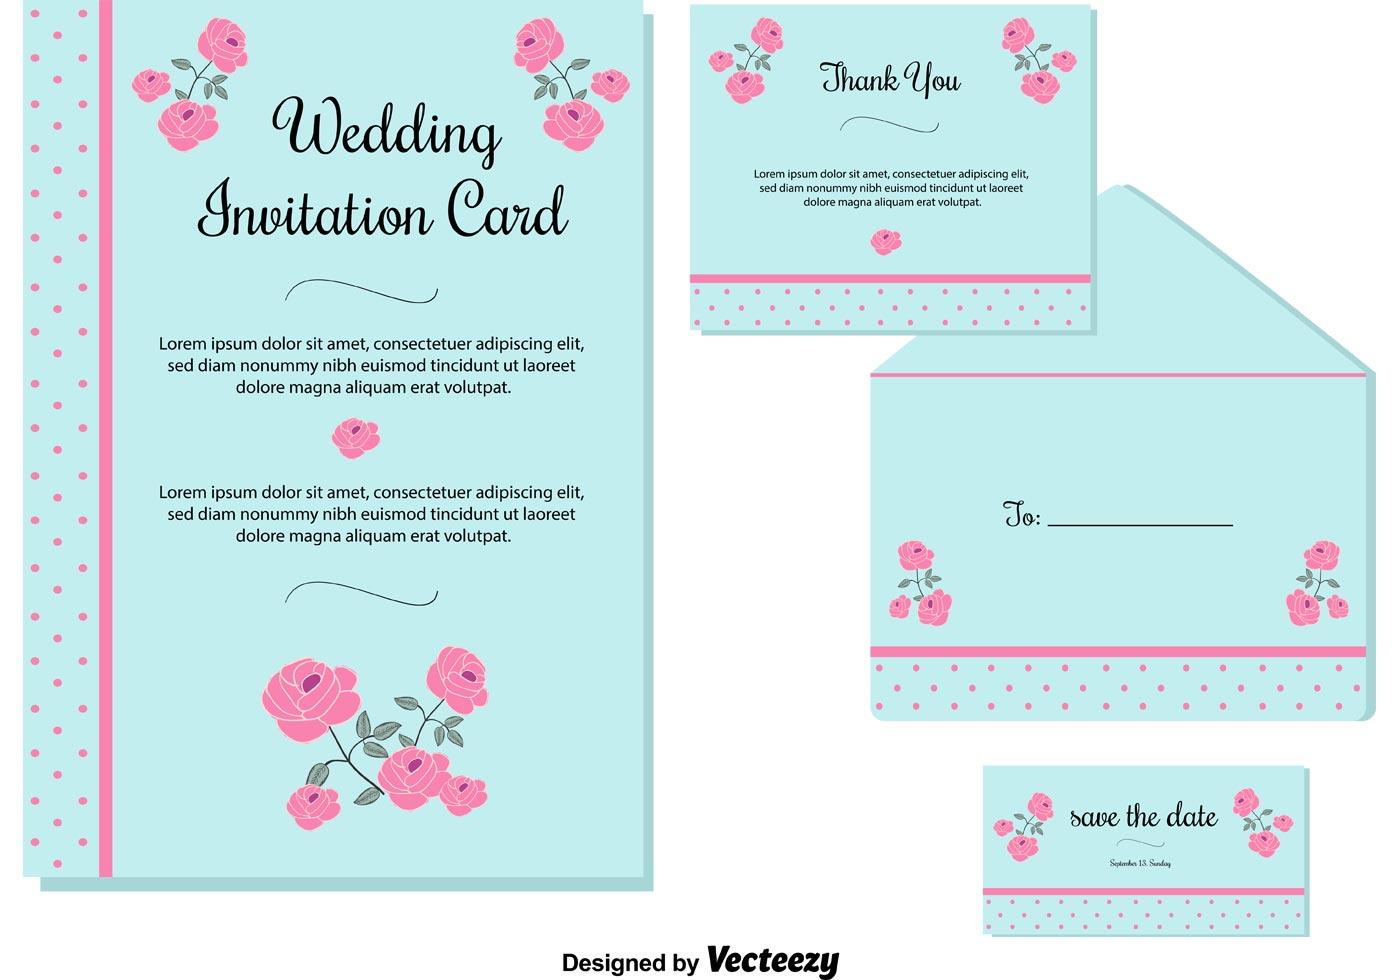 E Invitation Wedding Cards Free: Download Free Vector Art, Stock